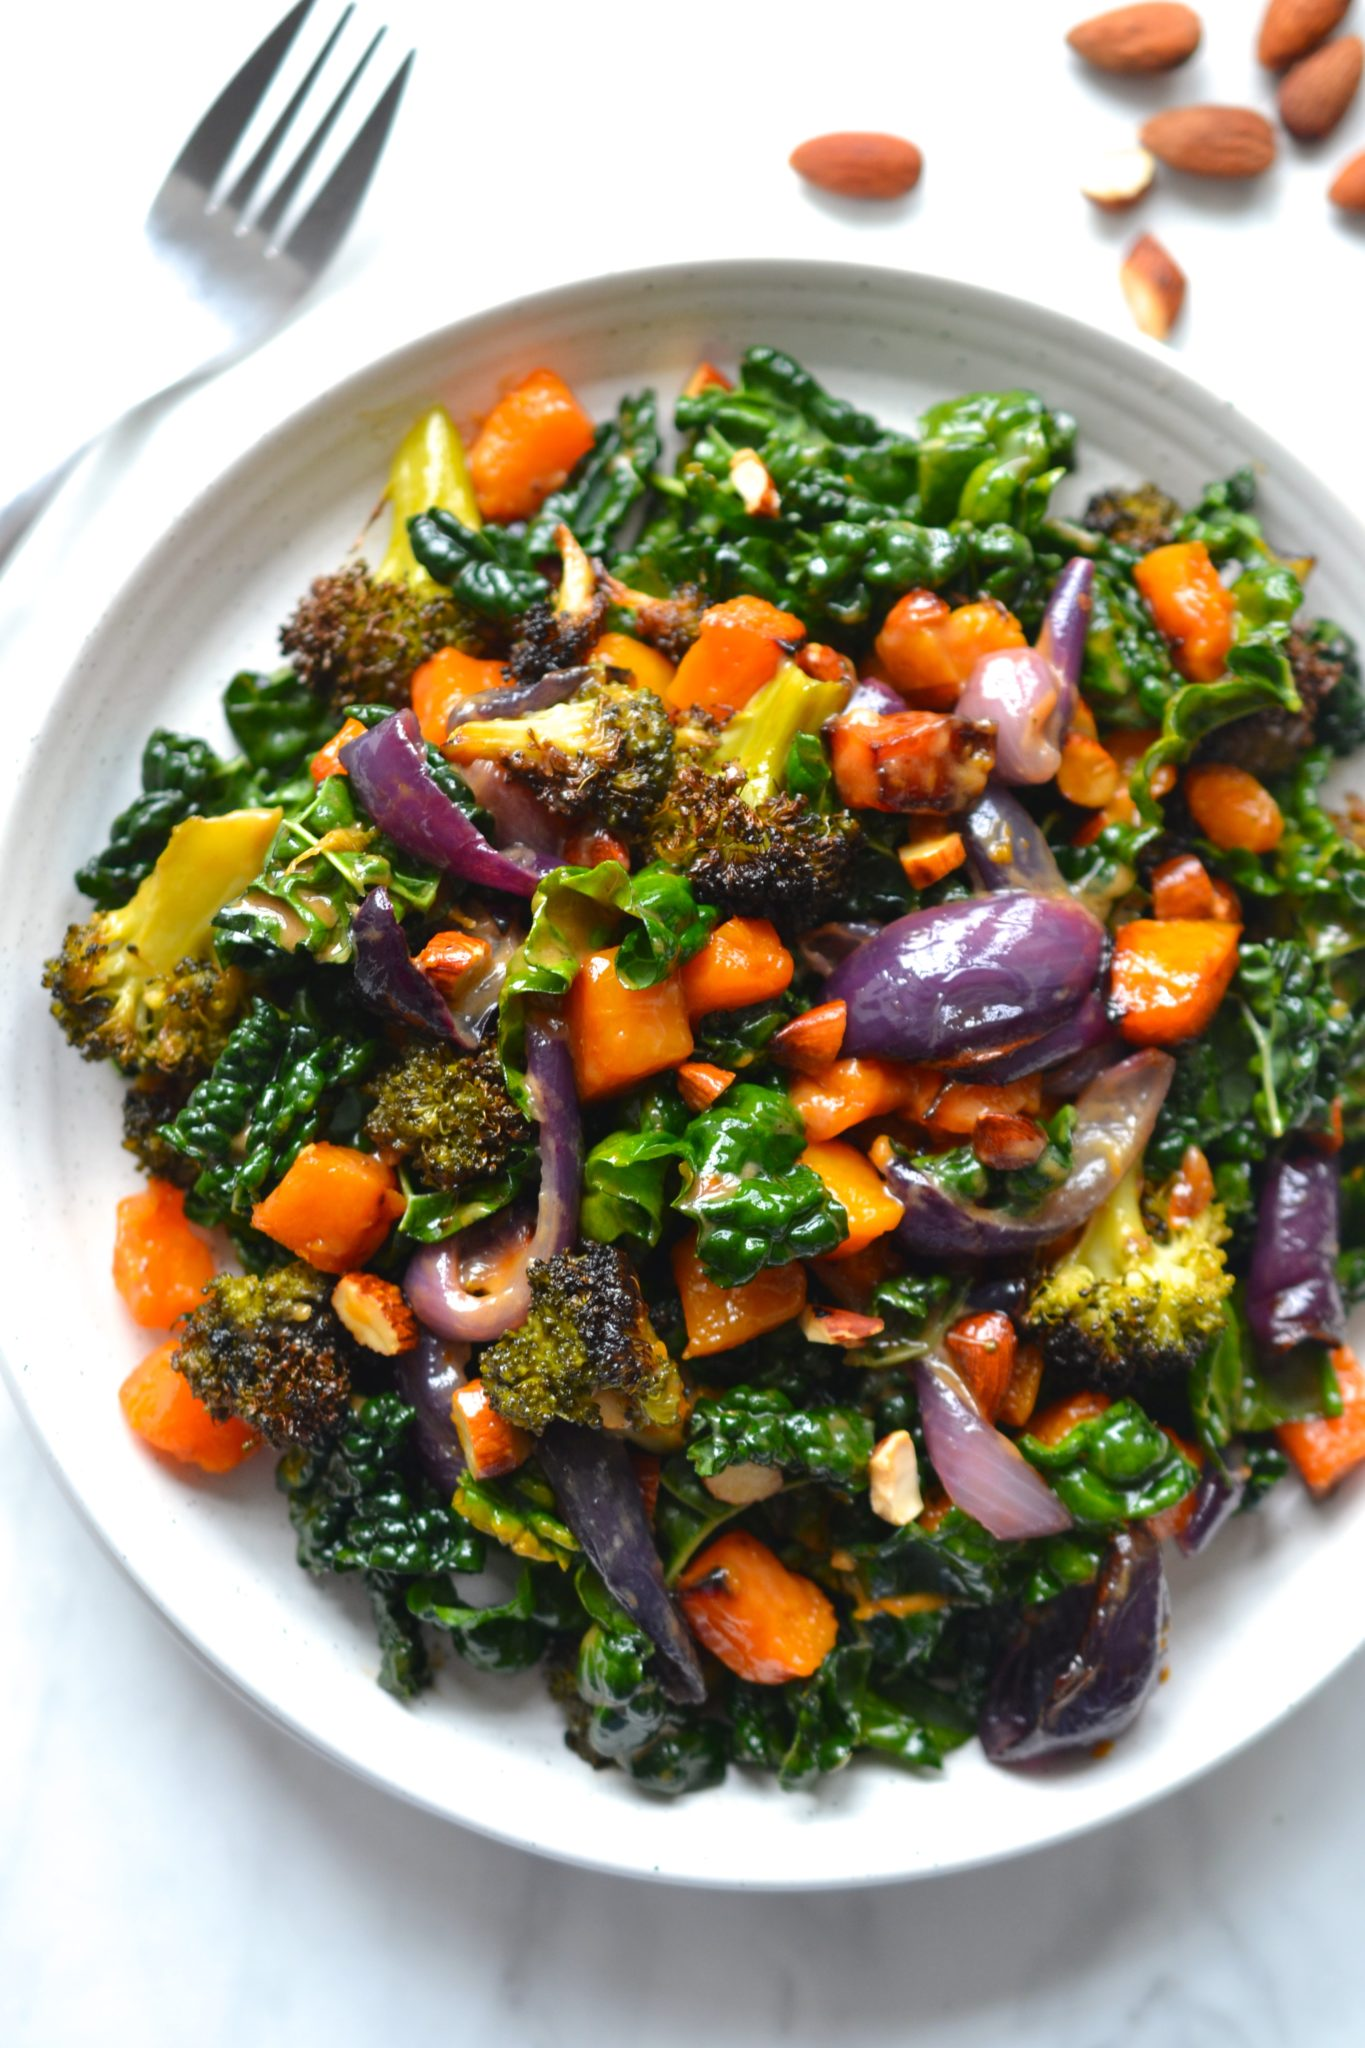 Butternut Squash & Kale Salad | Every Last Bite